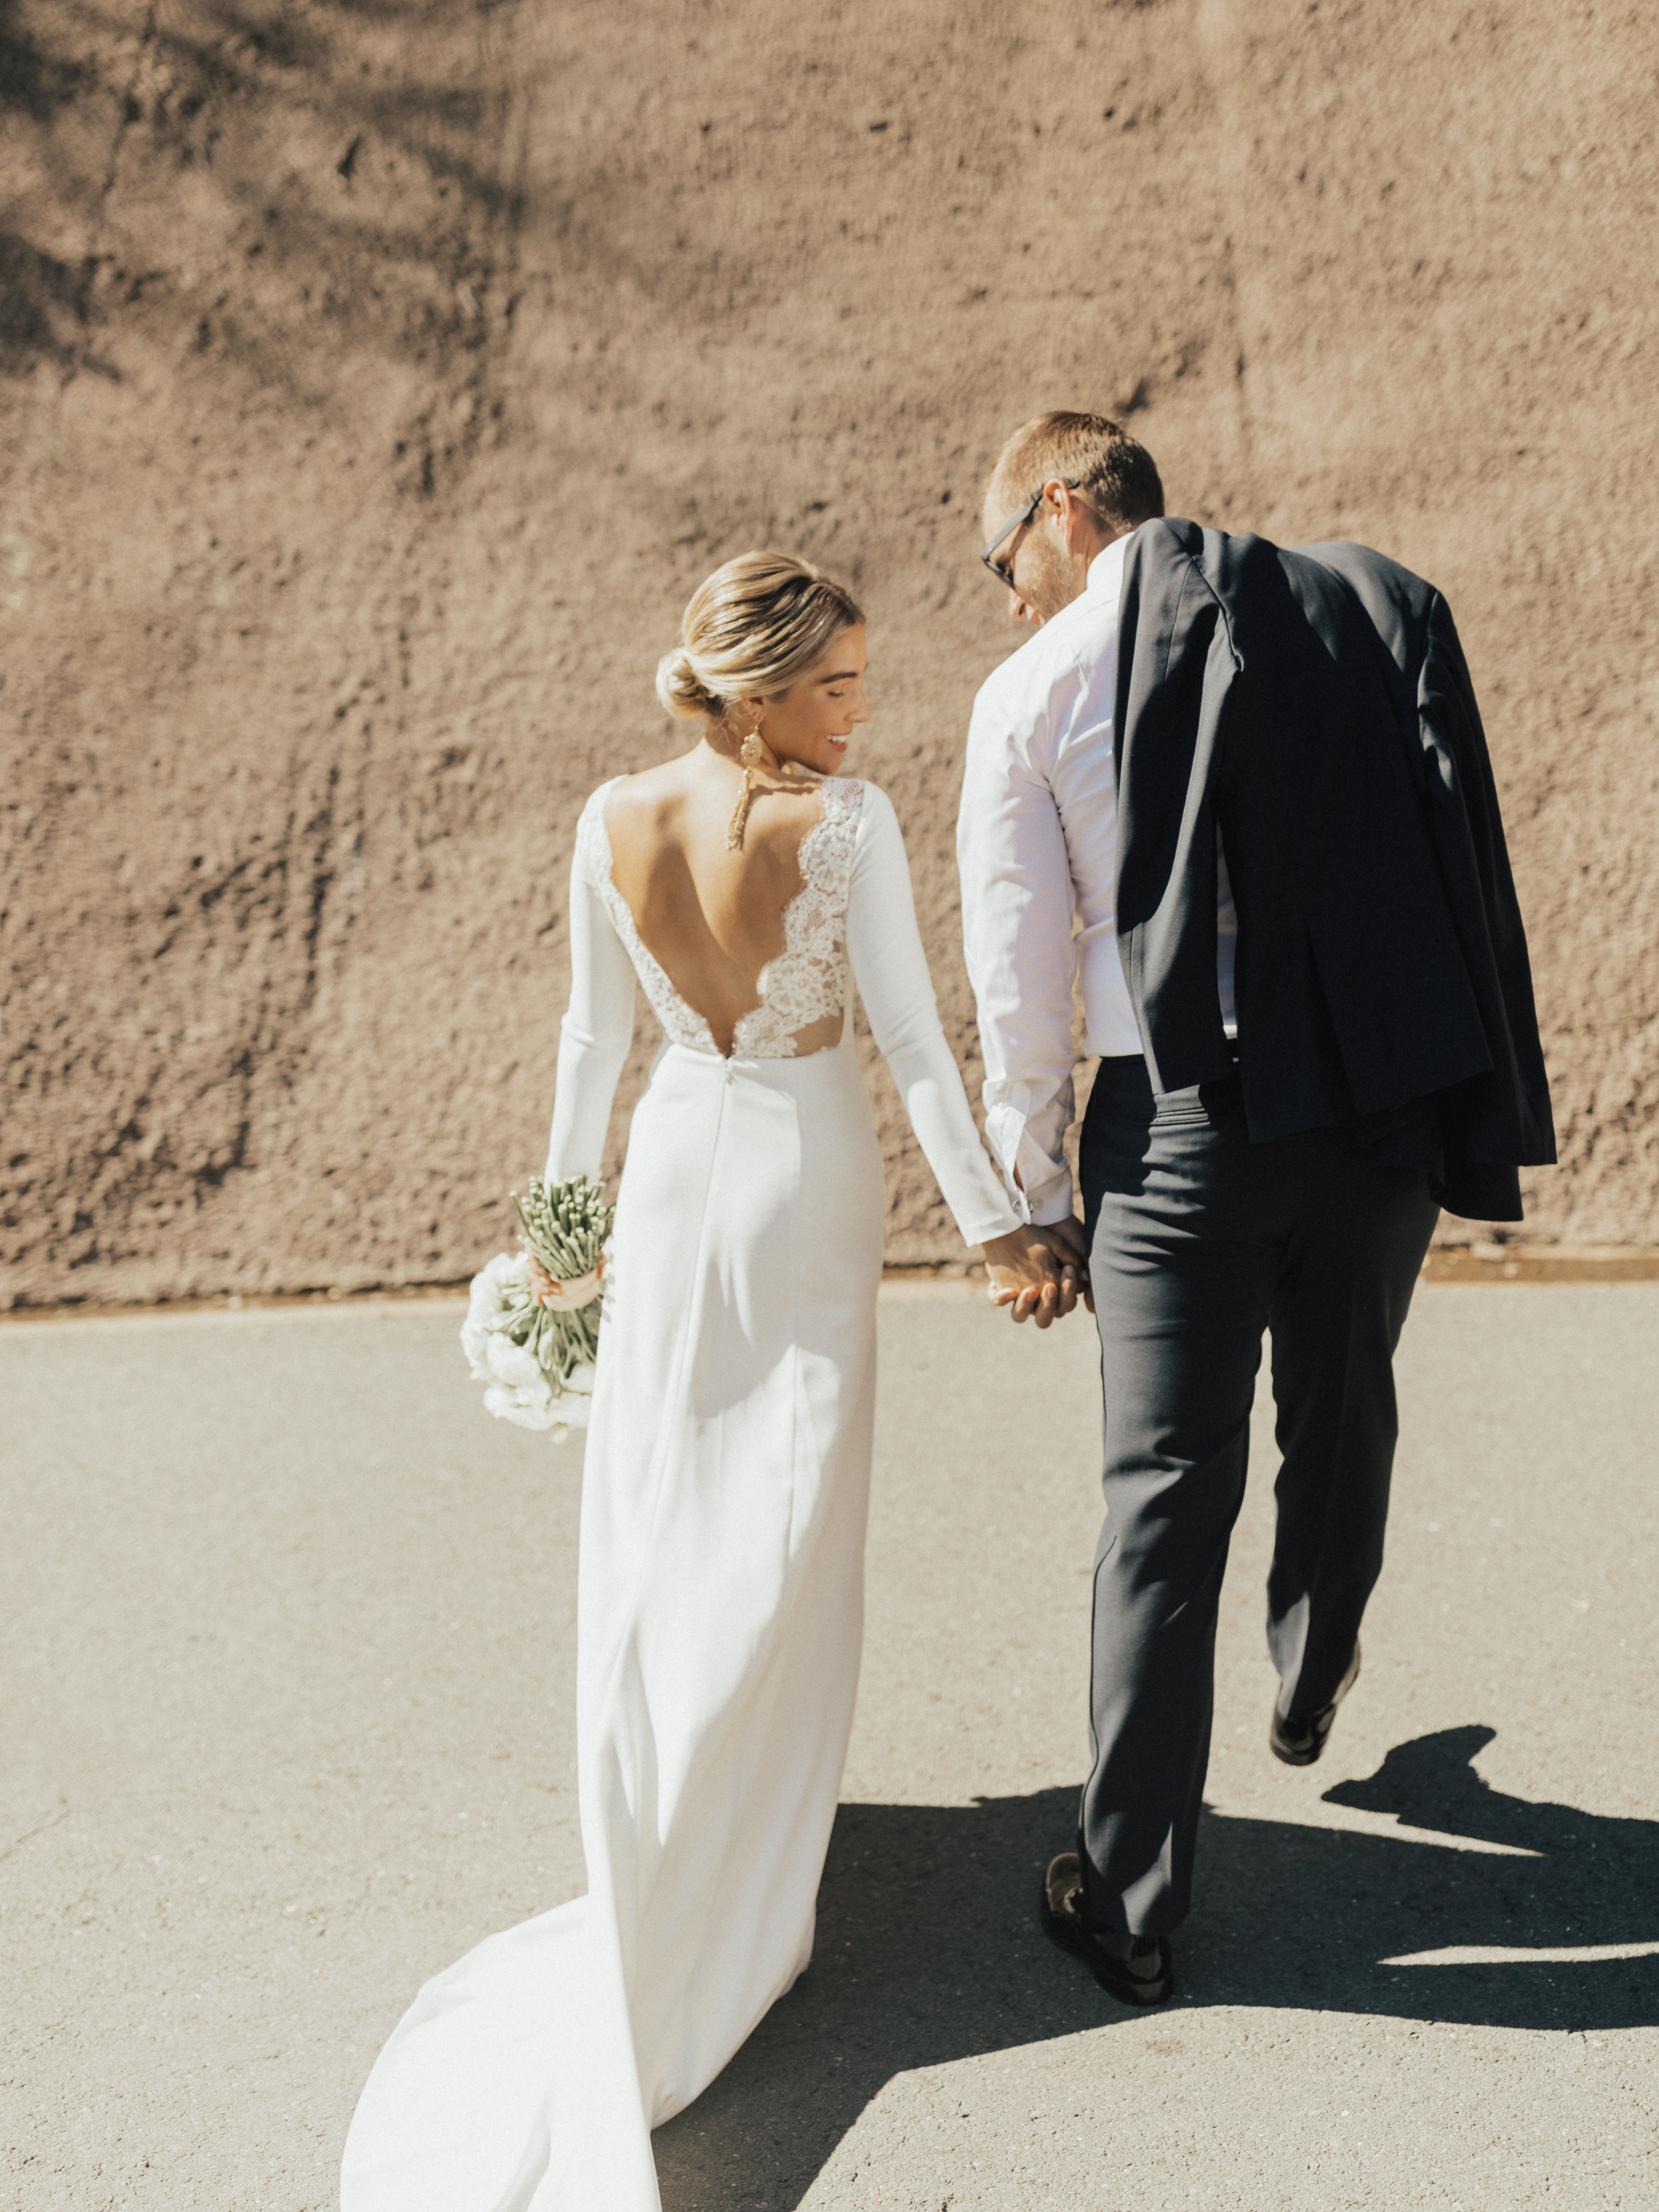 Amy Kuschel Redding Gown In 2020 Wedding Dresses Wedding Dress